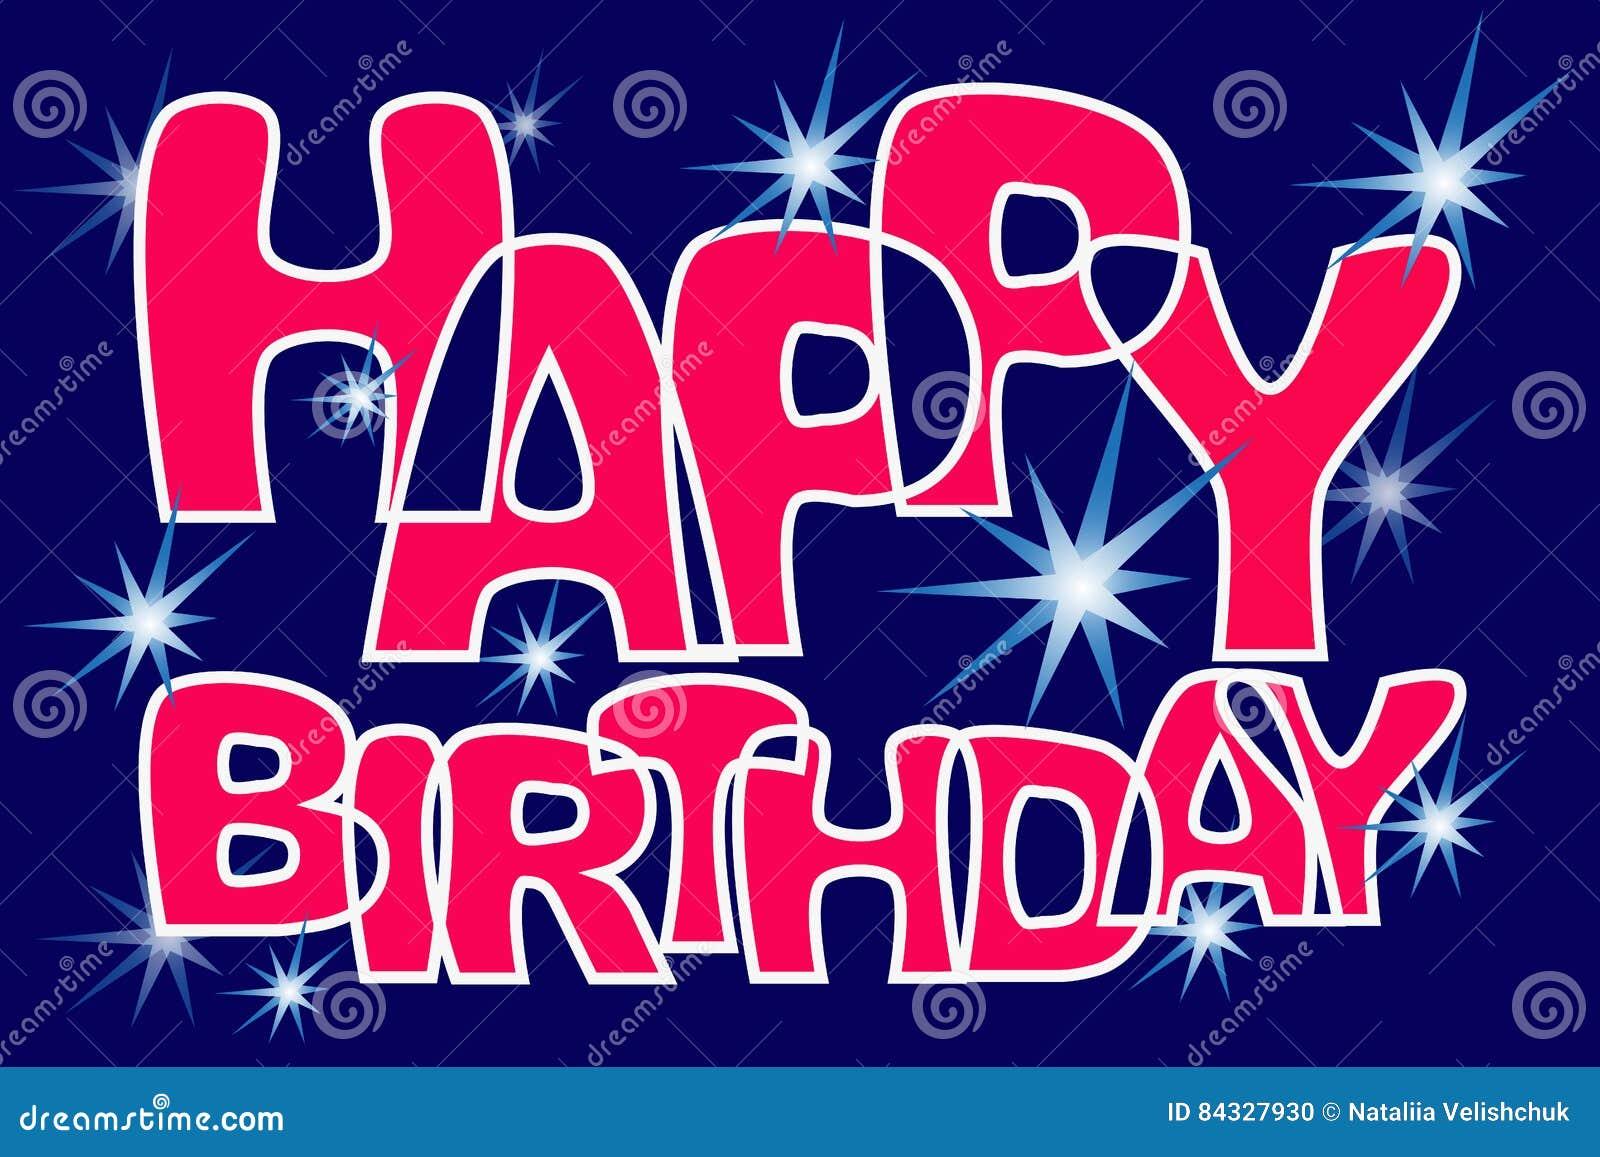 star congratulations happy birthday